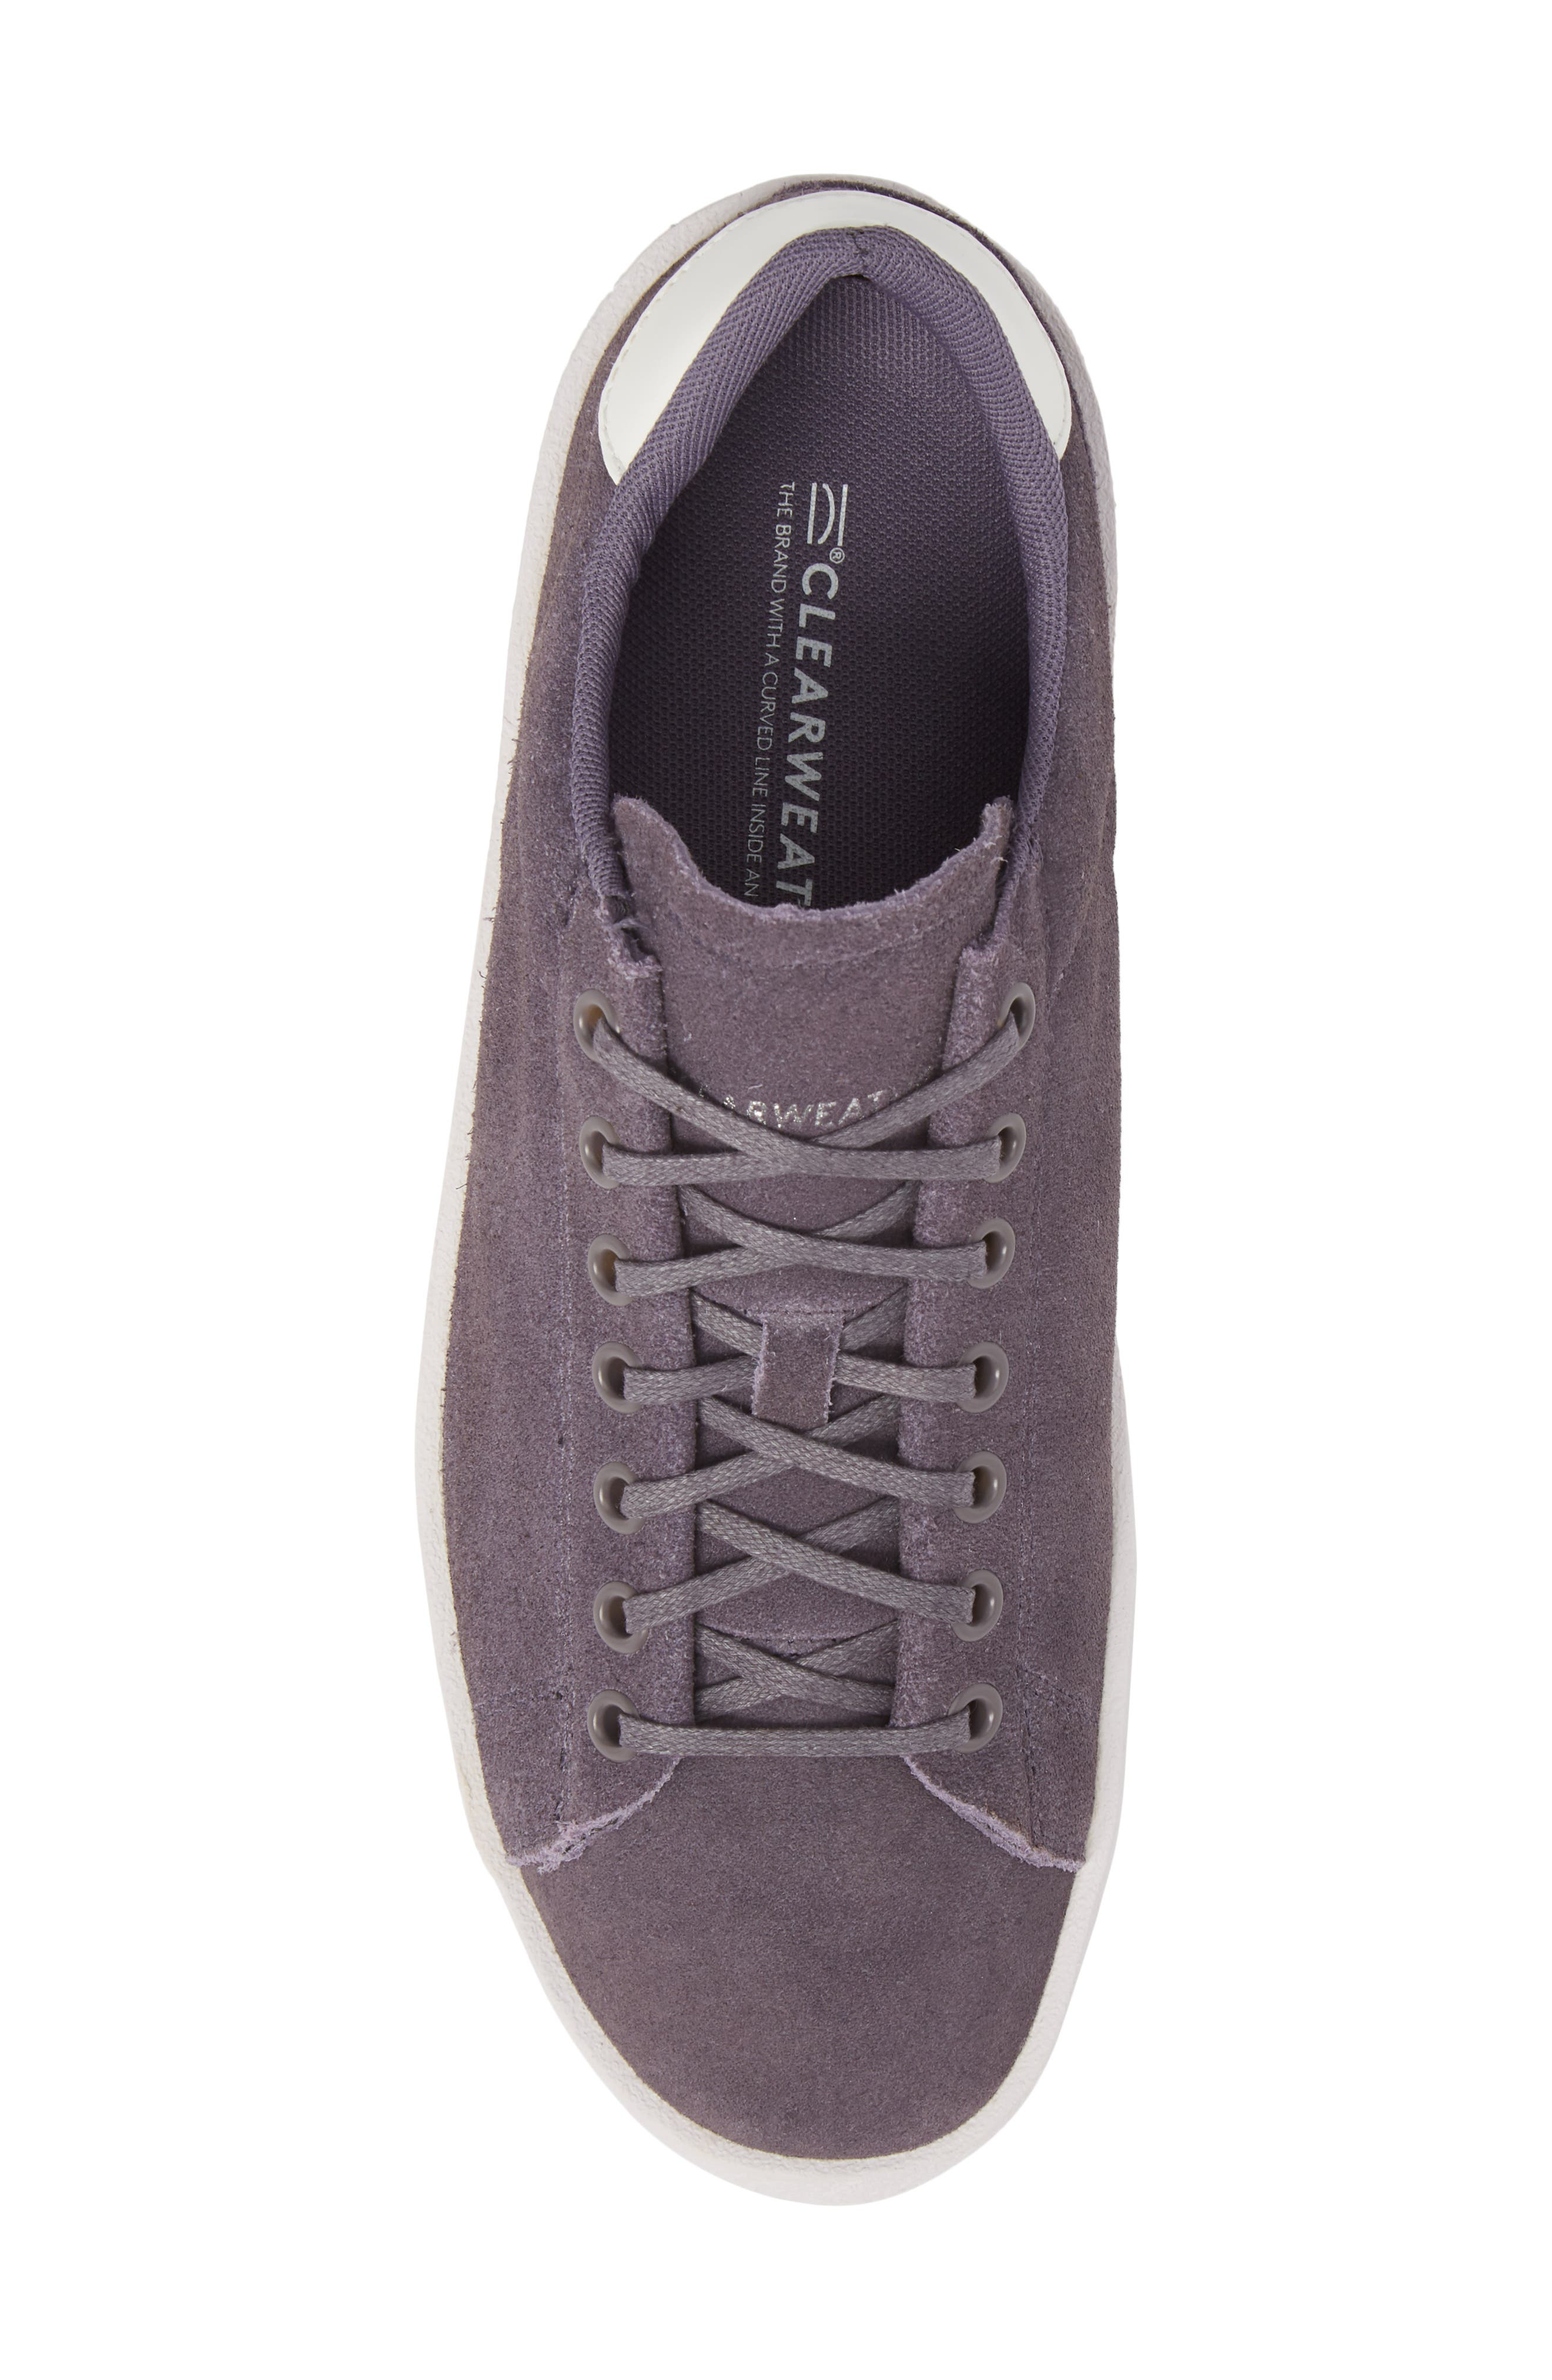 Jones Platform Sneaker,                             Alternate thumbnail 5, color,                             Purple Leather